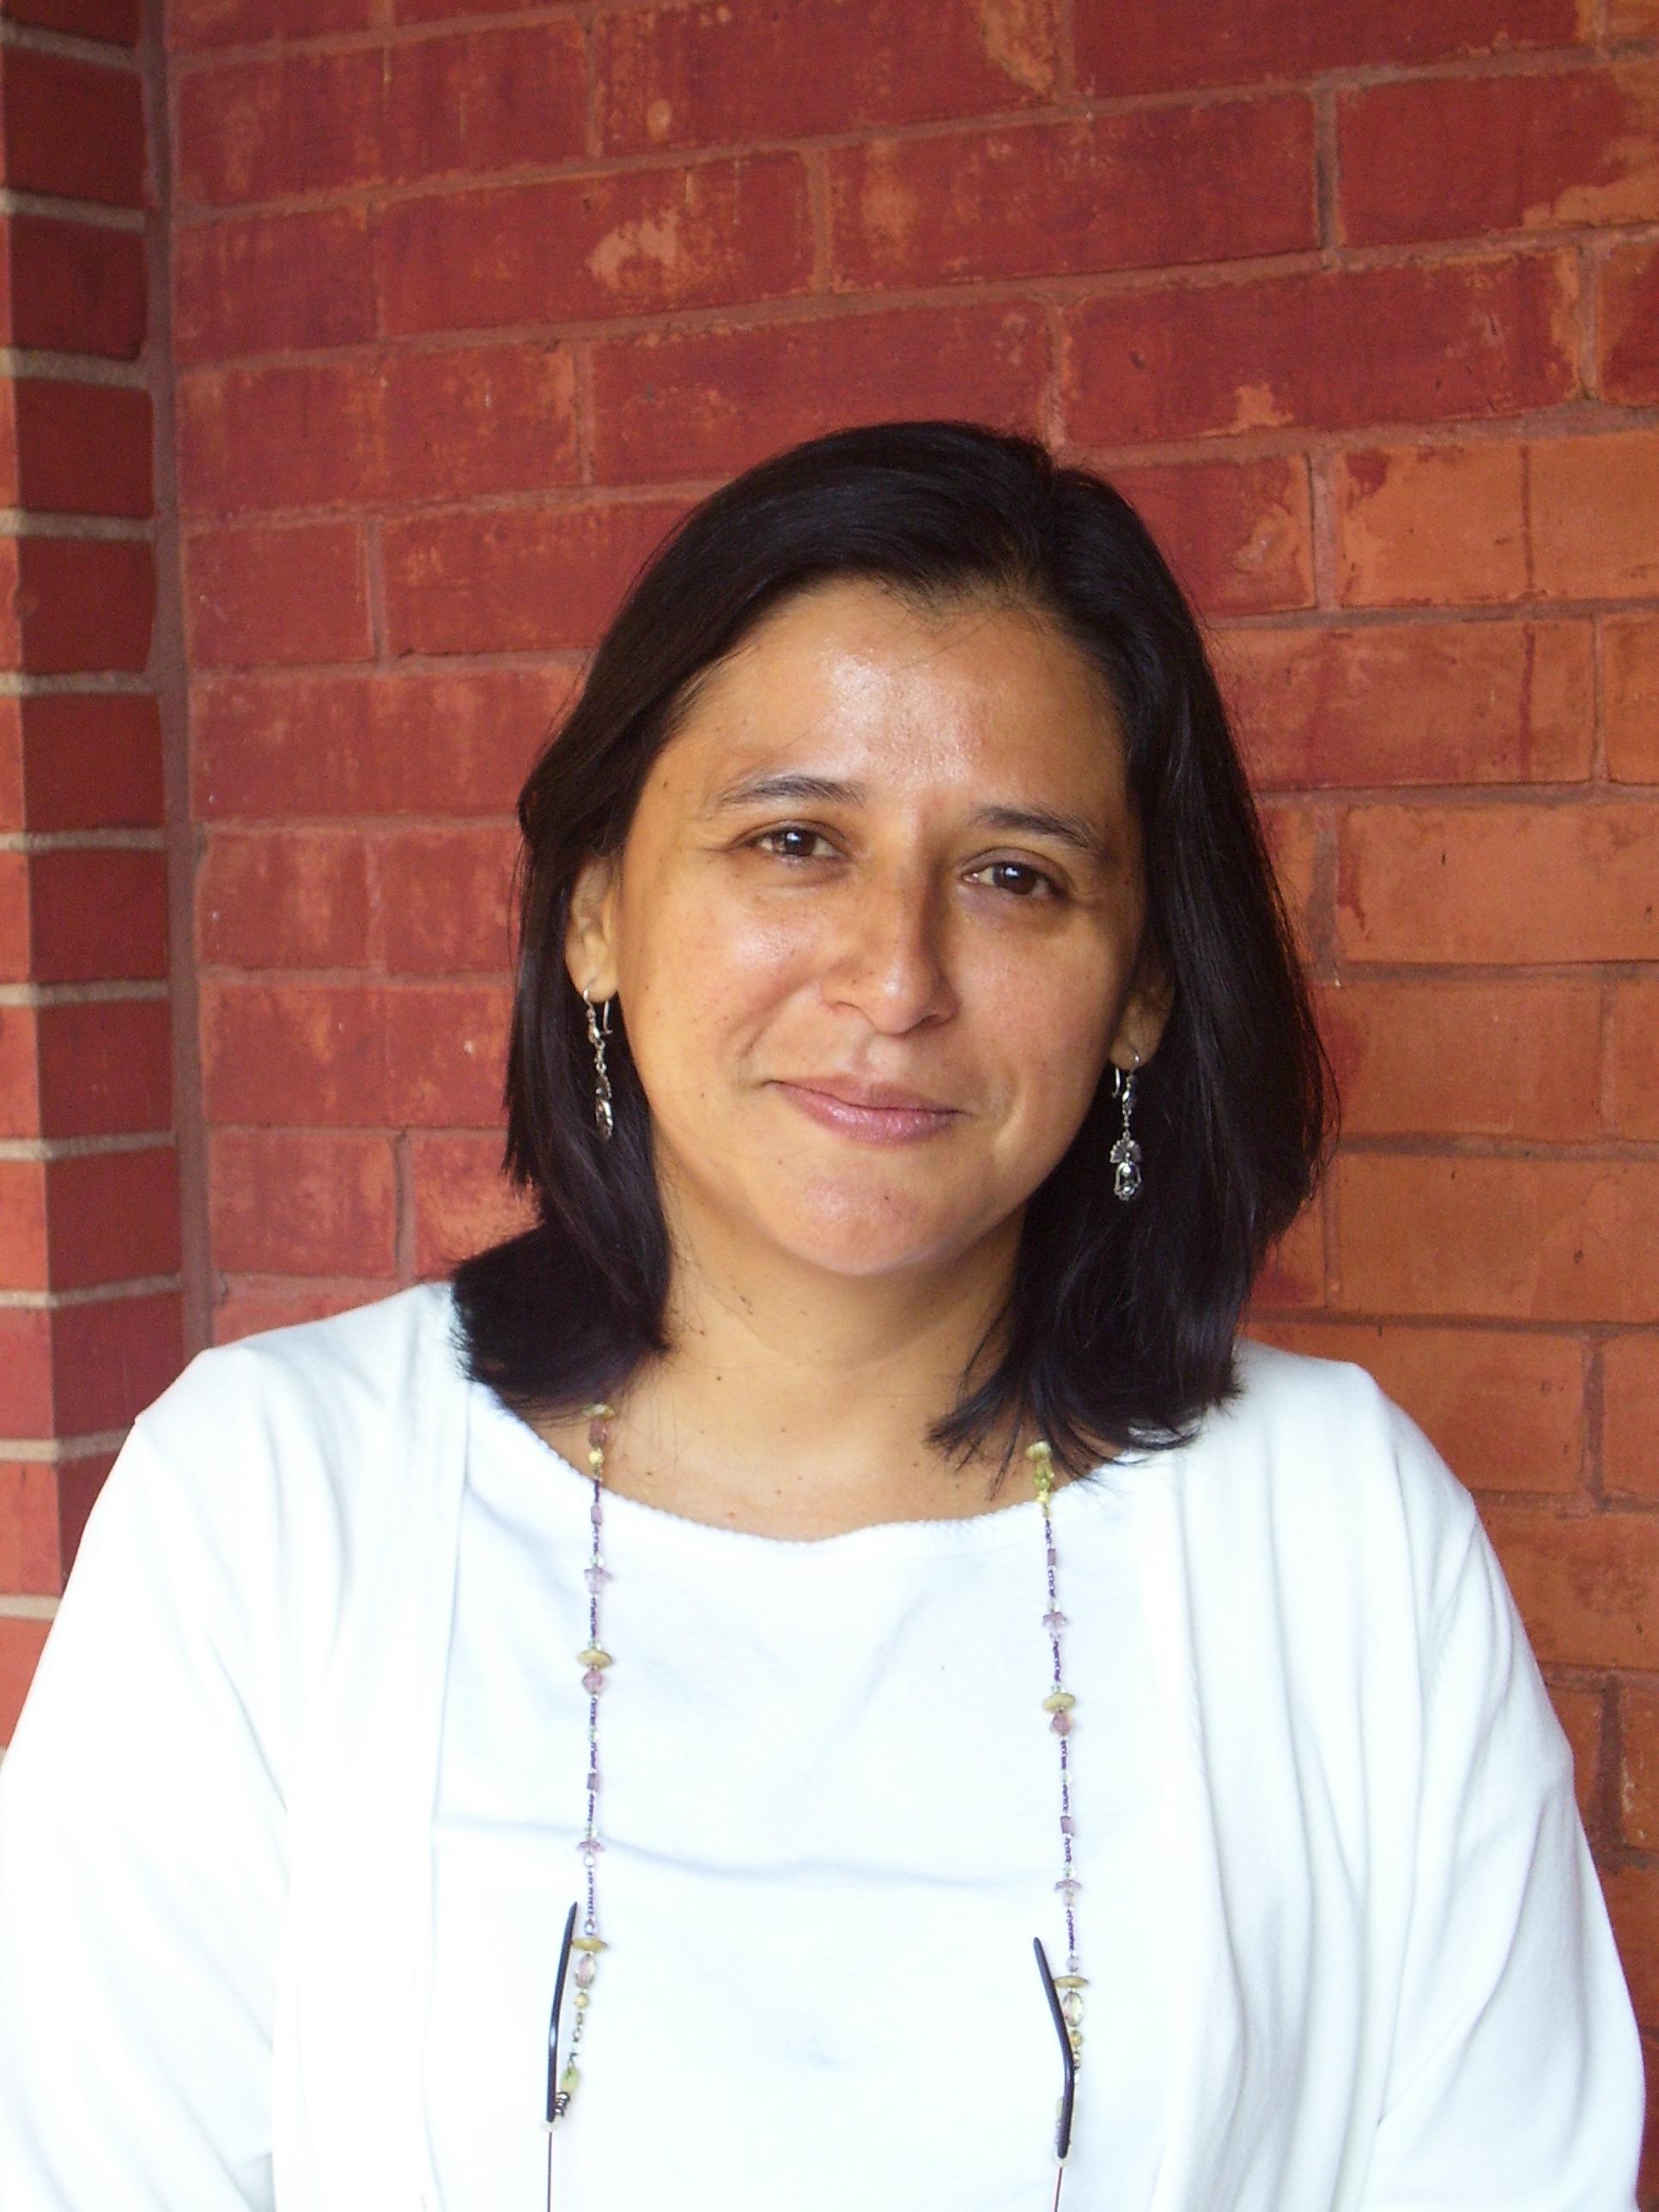 Professor Liliana Sanchez